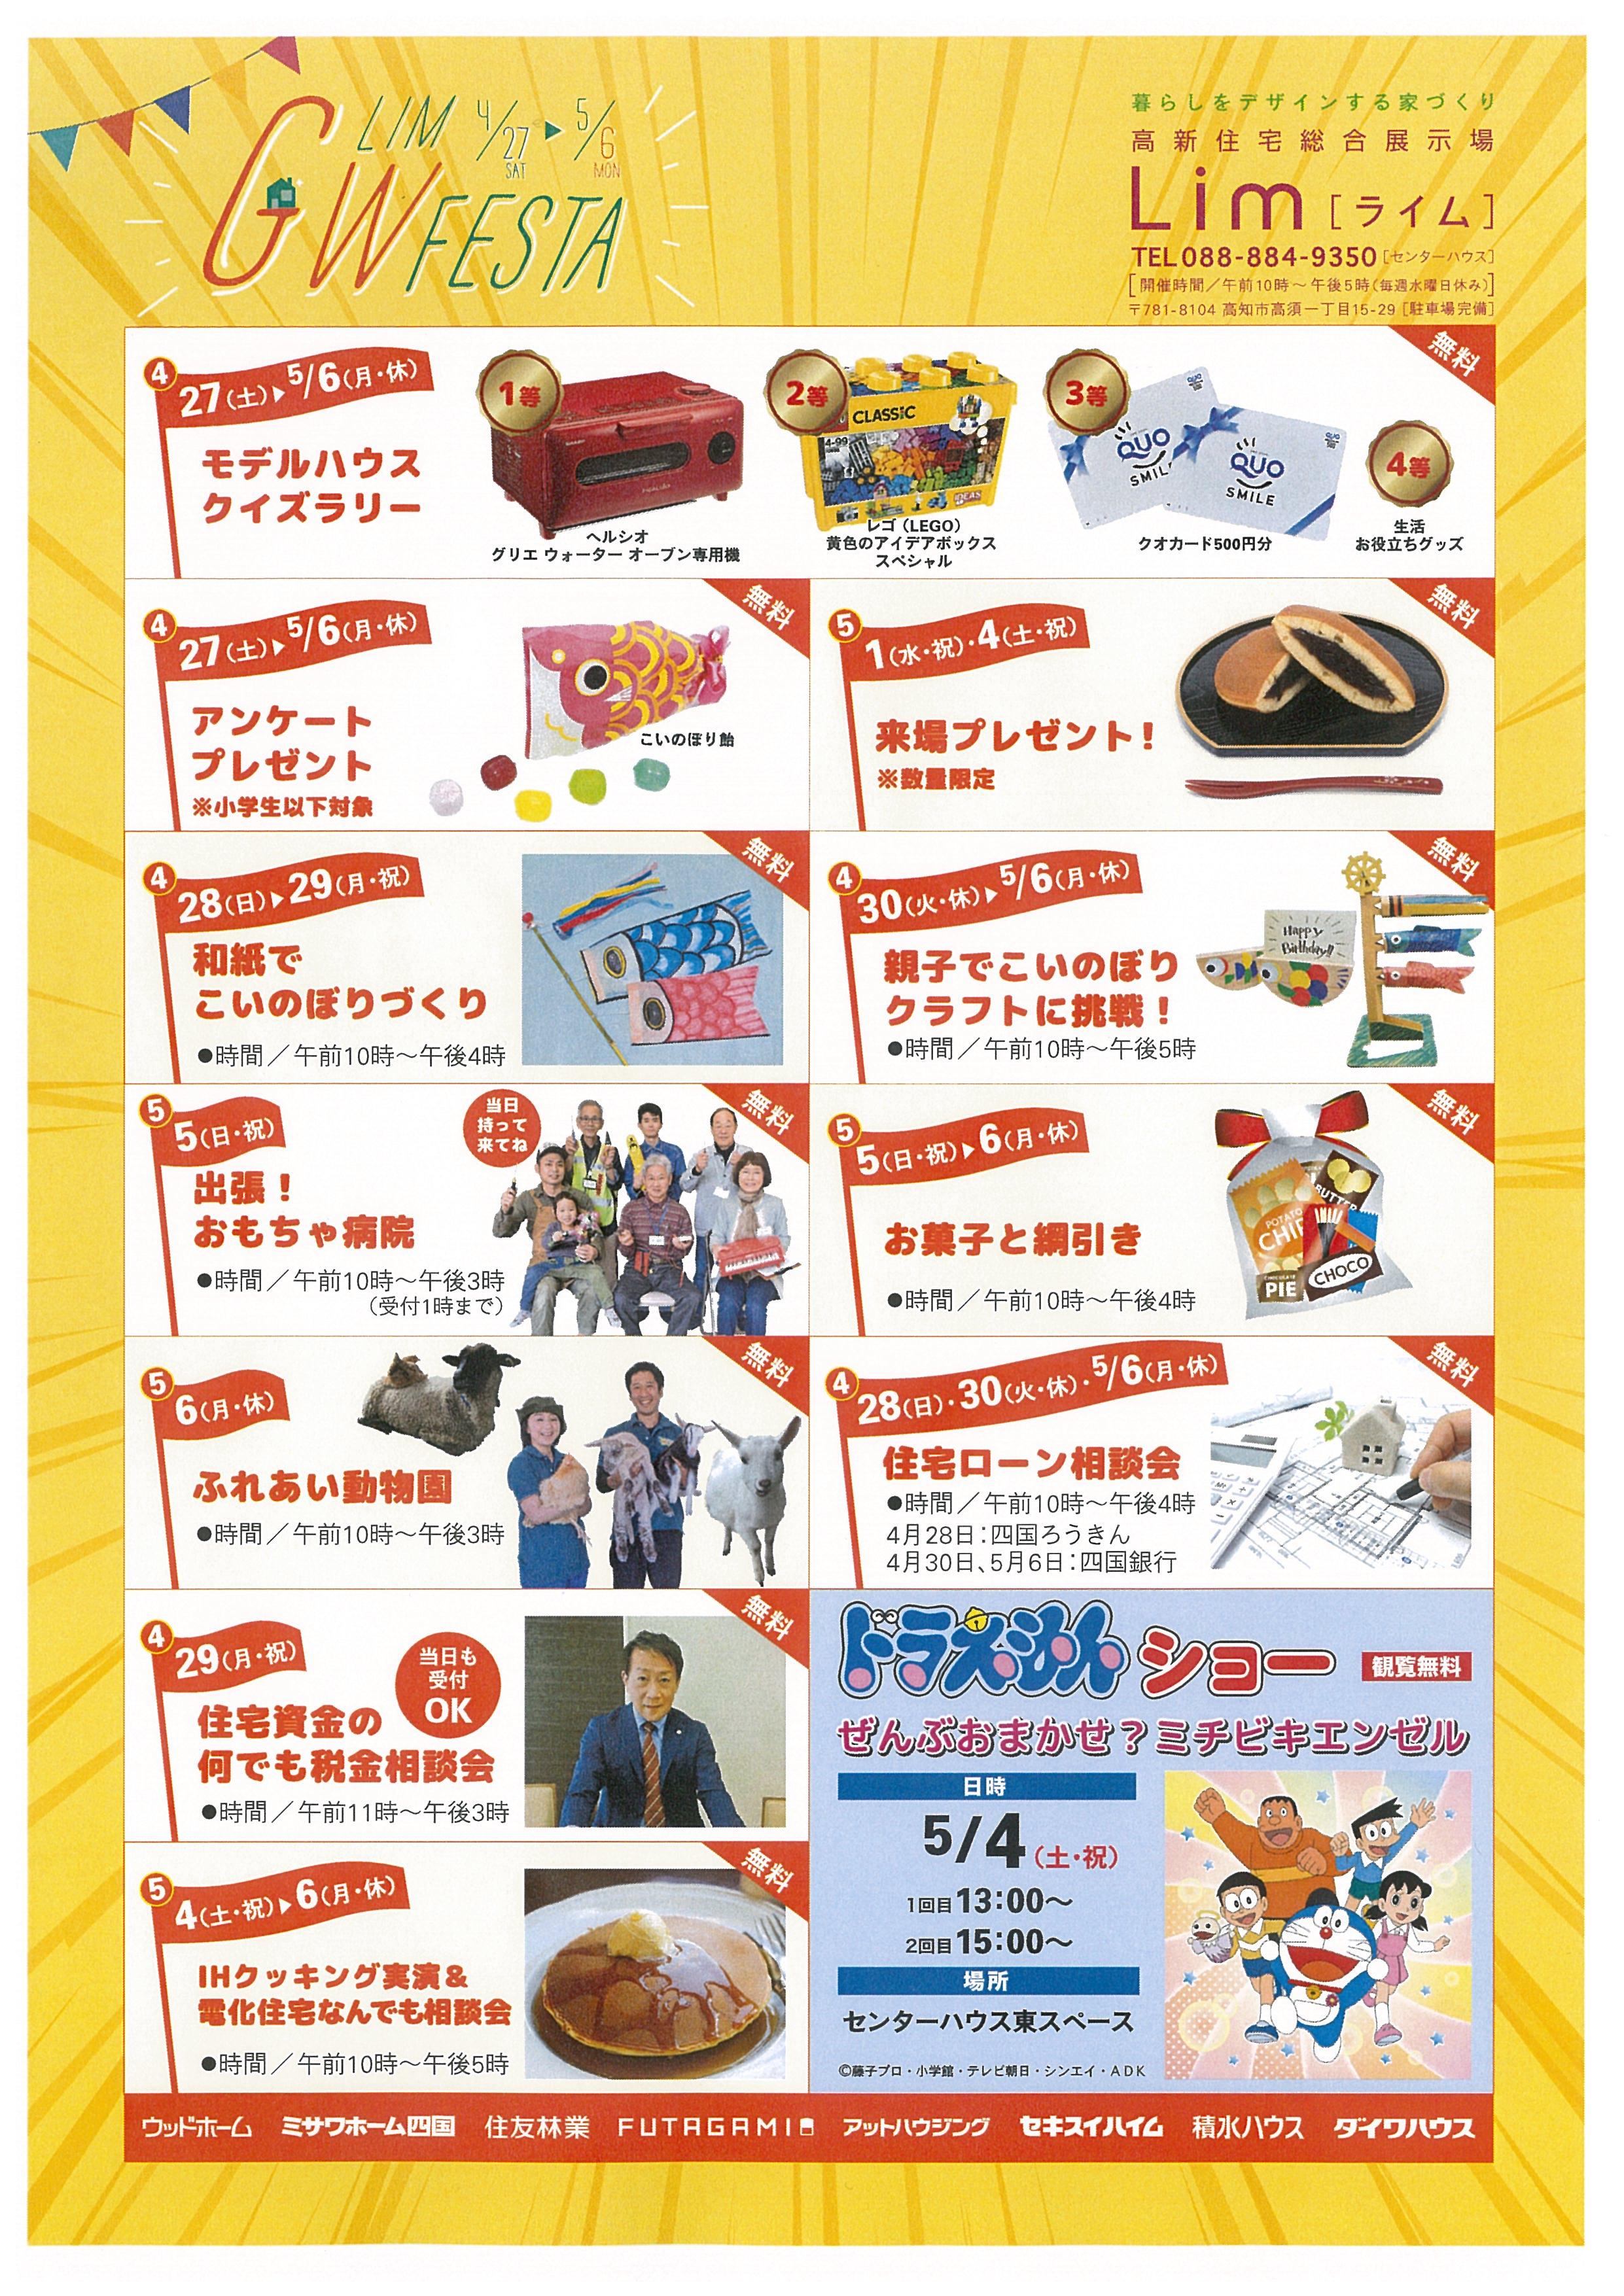 http://shikoku.misawa.co.jp/area_kouchi/%E3%83%A9%E3%82%A4%E3%83%A0GW%E3%82%A4%E3%83%99%E3%83%B3%E3%83%88.jpg